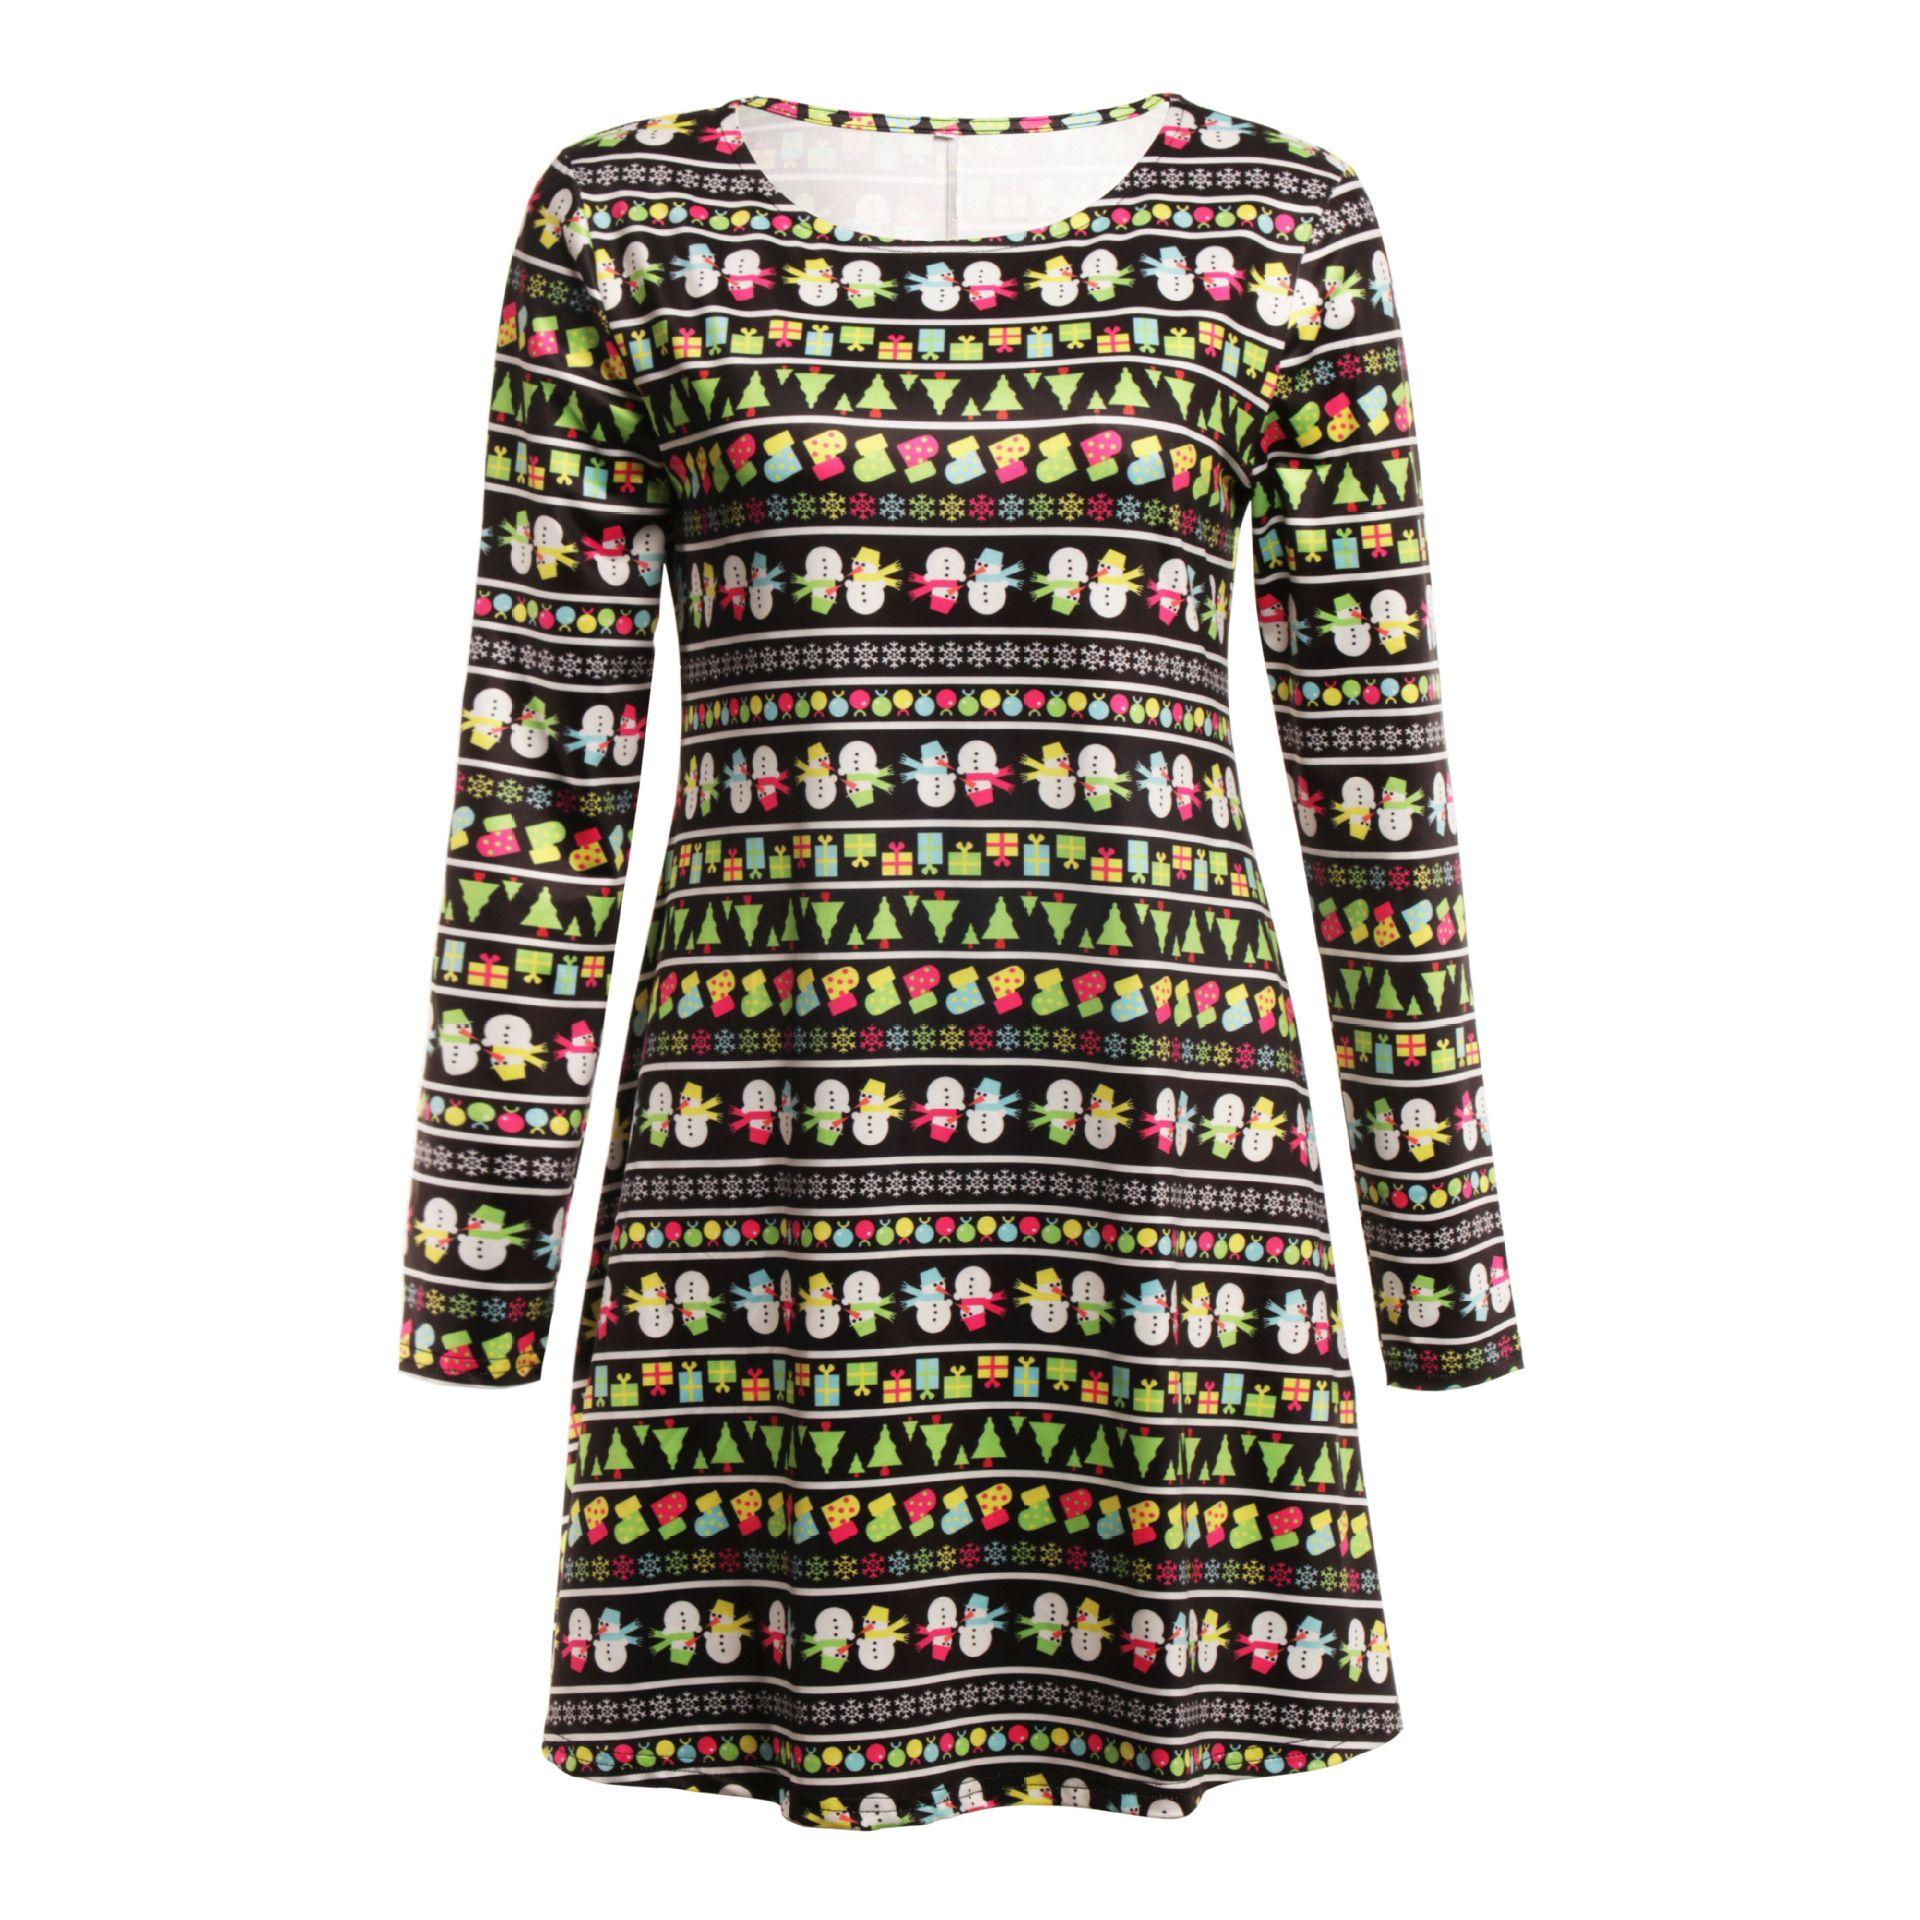 Print Long Sleeve Autumn Winter Christmas Dress Women 19 Casual Loose Short Party Dress Plus Size S-5XL Vestidos 5